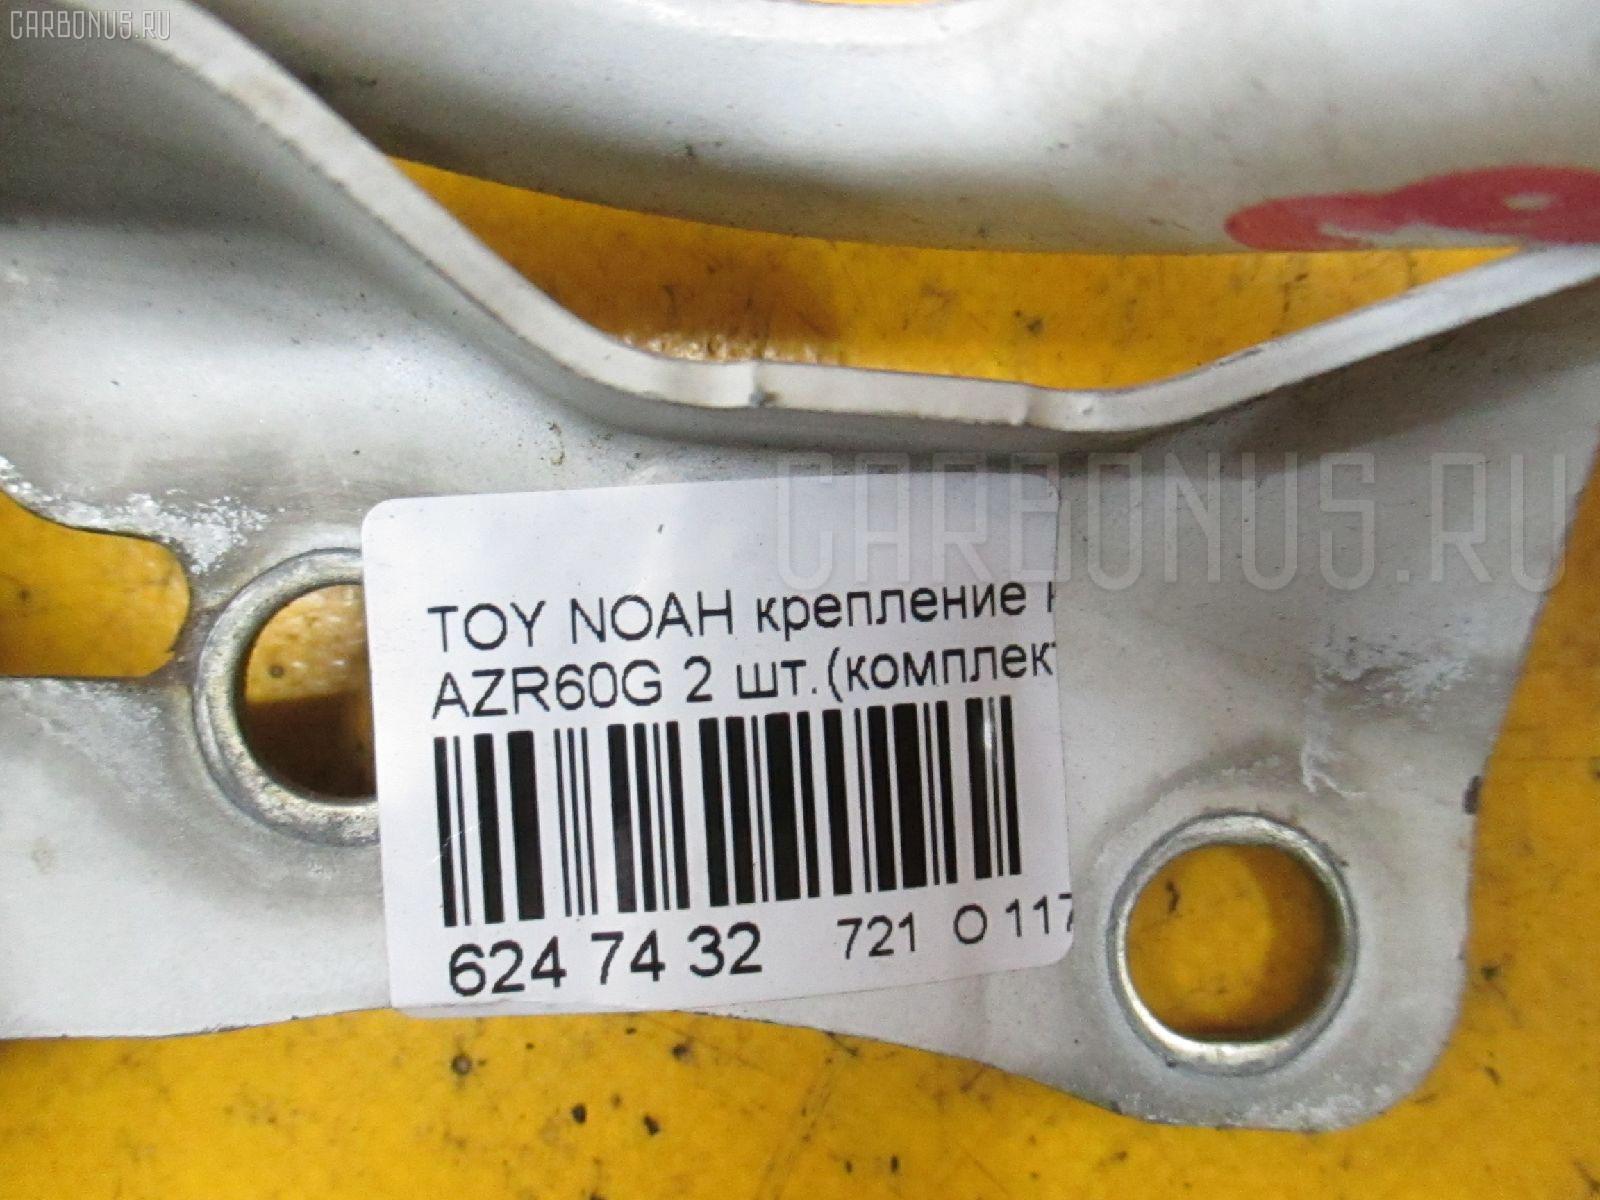 Крепление капота TOYOTA NOAH AZR60G Фото 2